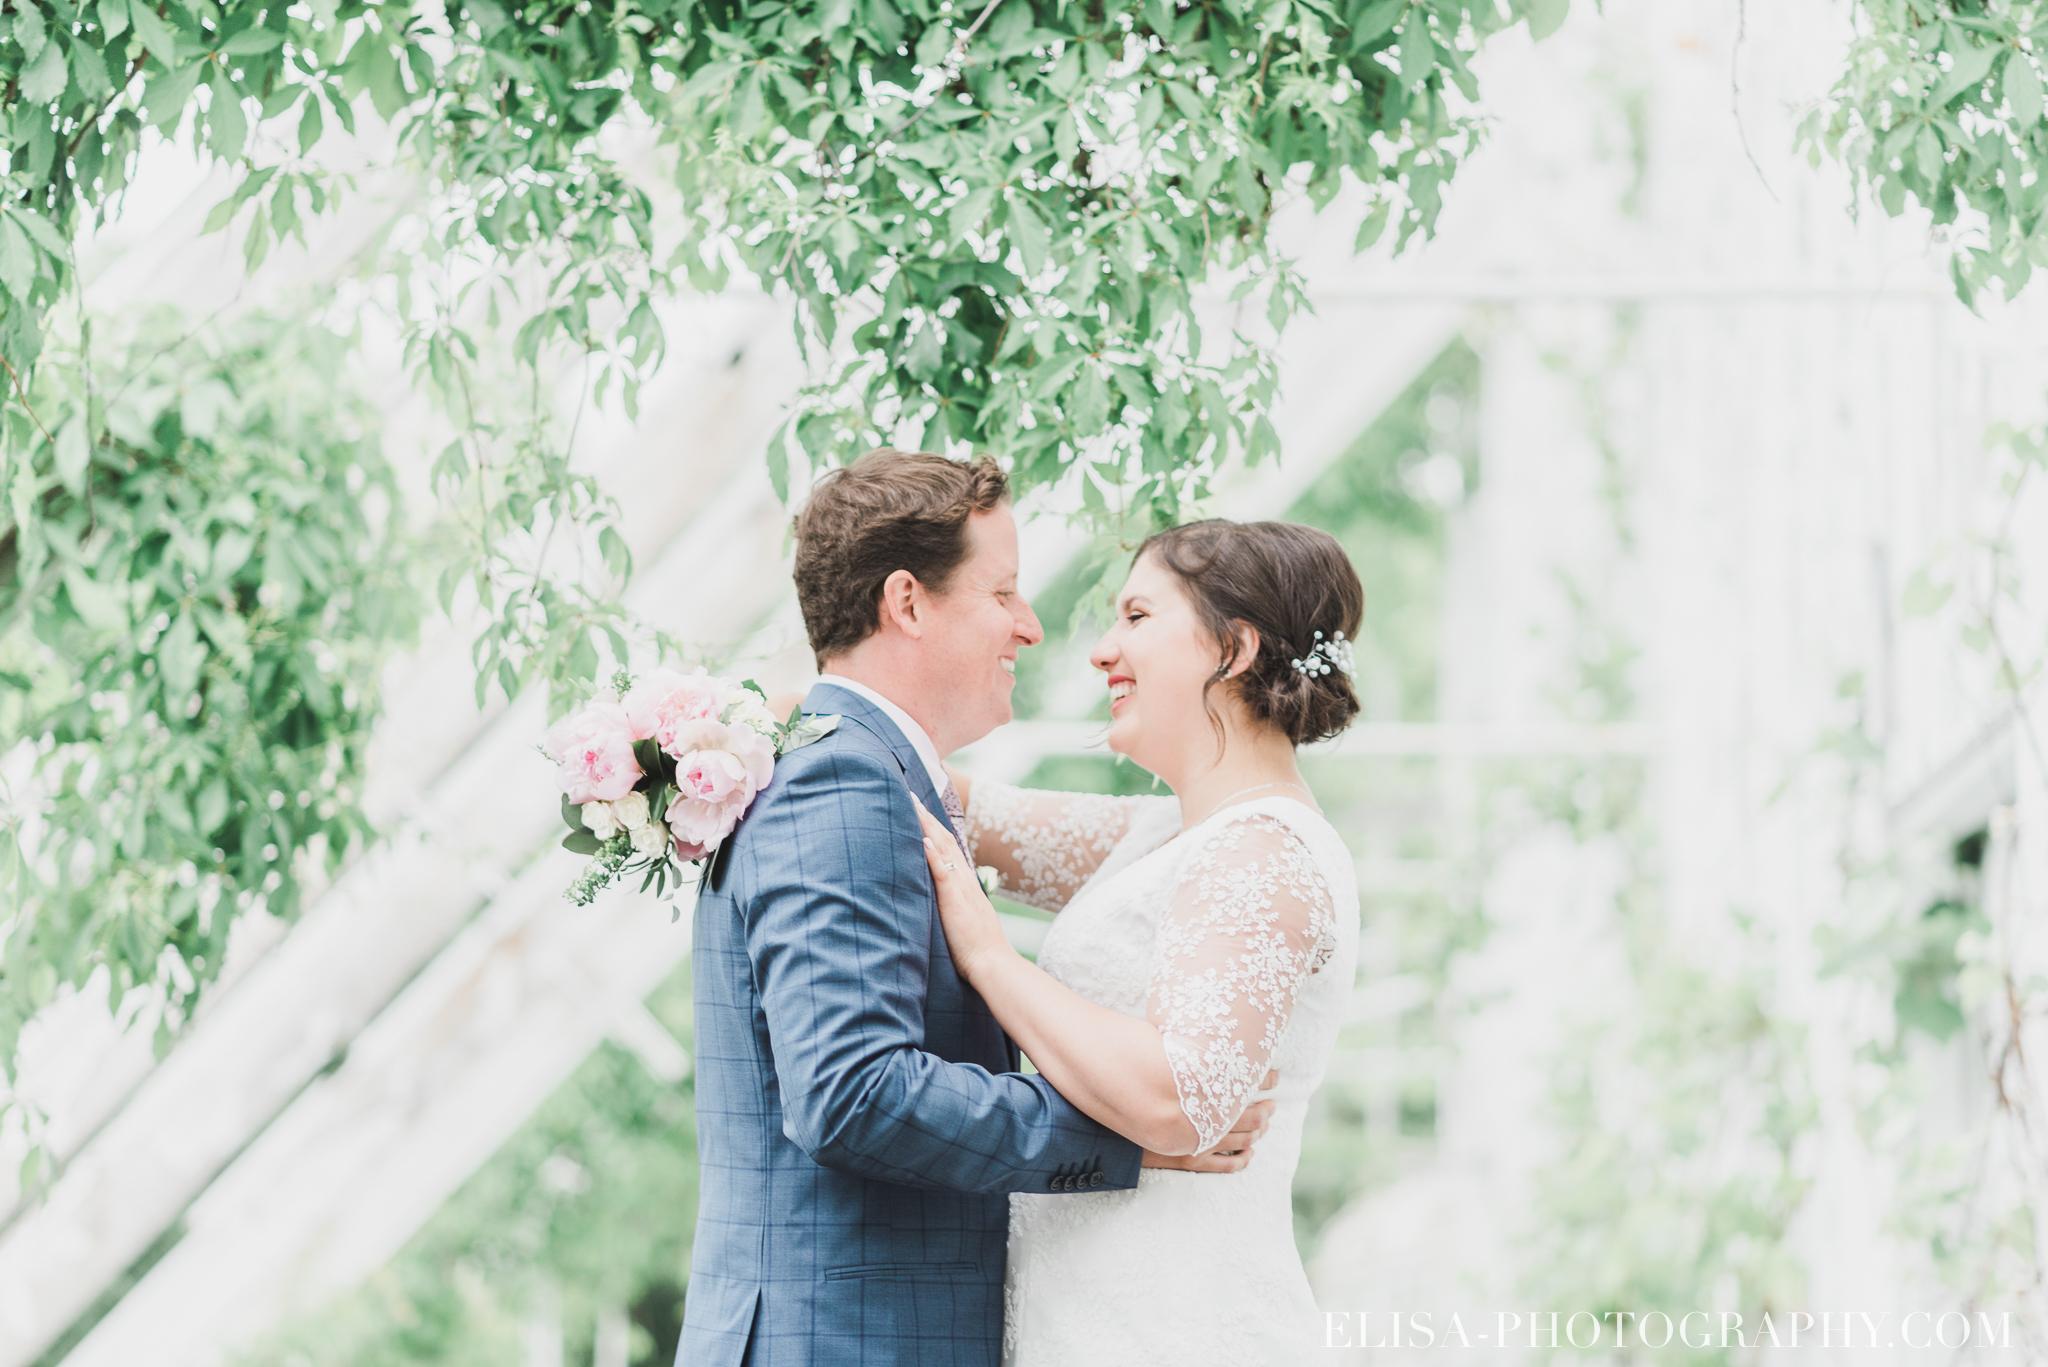 photo mariage domaine cataraqui wedding portrait couple inspiration anglaise jardin ville de quebec 2597 - Mariage d'inspiration anglaise au domaine Cataraqui